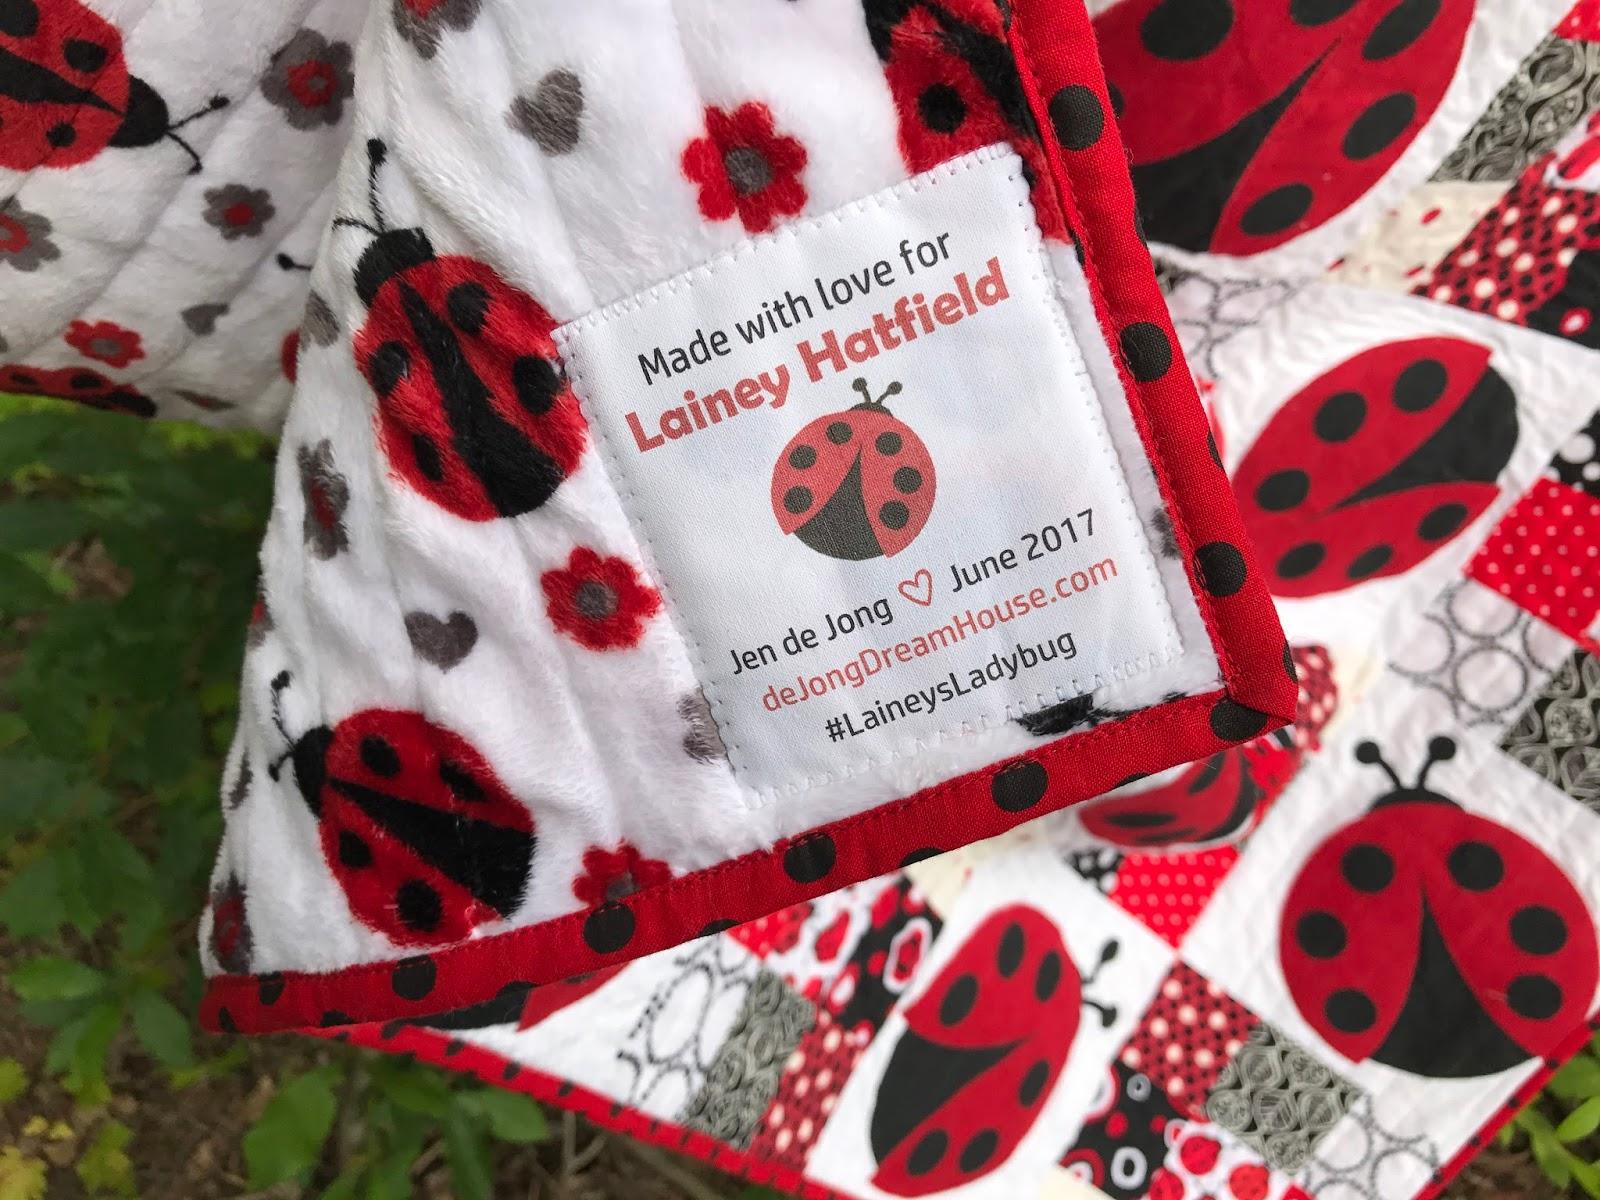 de Jong Dream House: #82: Lainey's Ladybug : lady bug quilts - Adamdwight.com